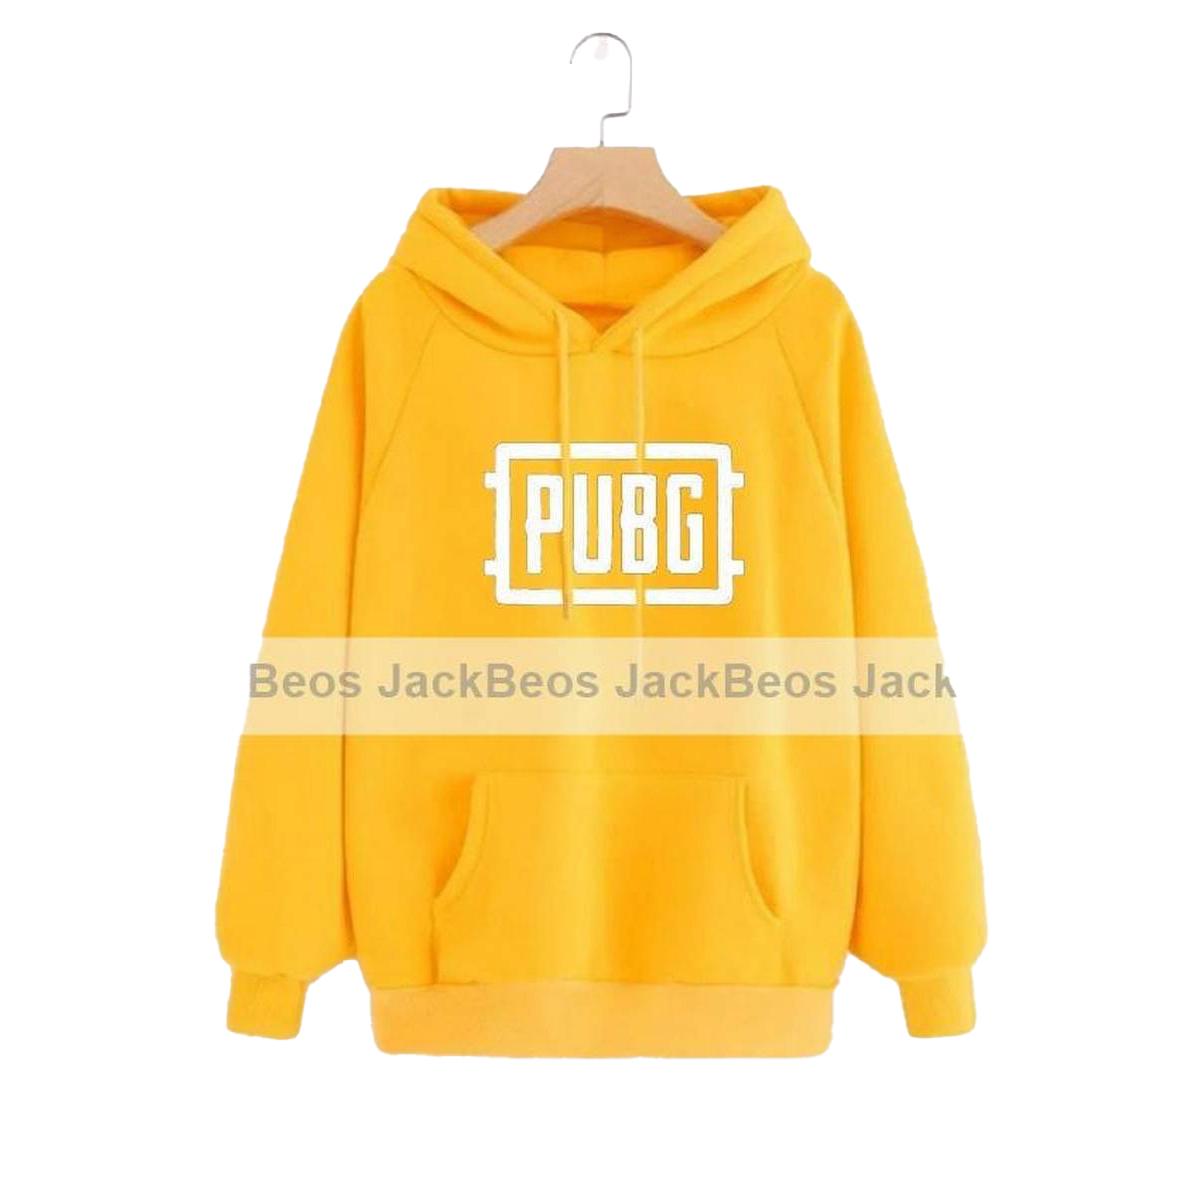 Pubg Fleece Printed Pull Over Hoodie for Men - Yellow